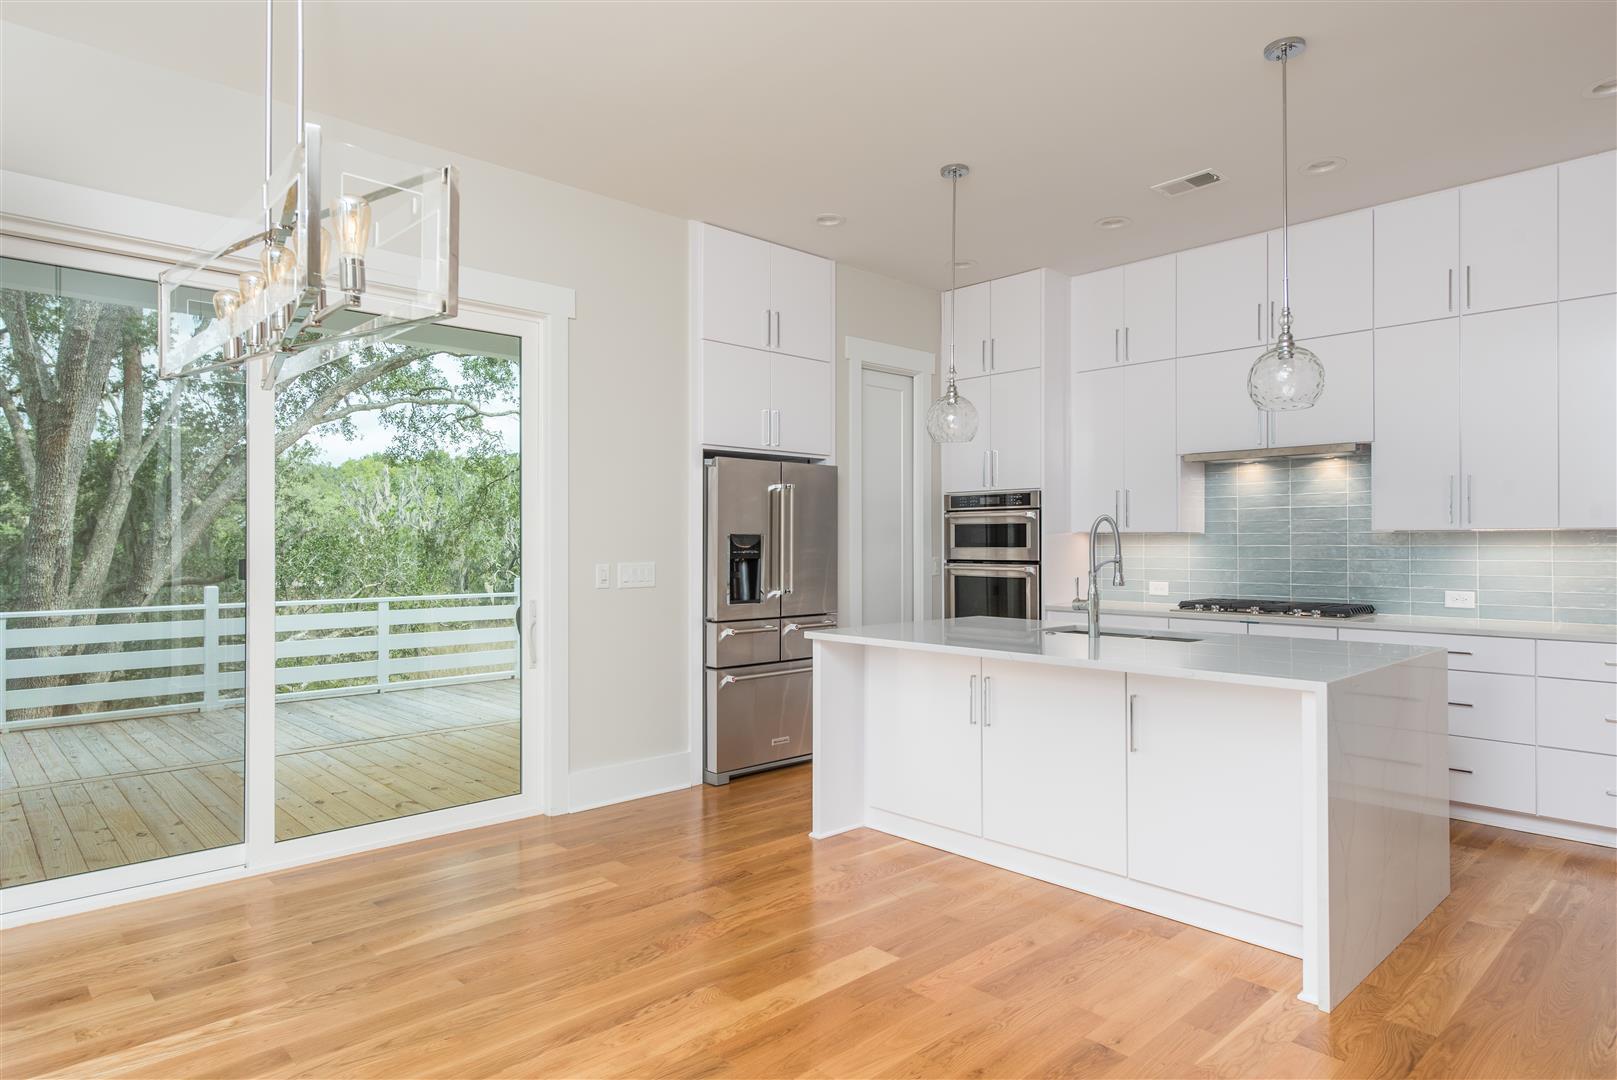 Scanlonville Homes For Sale - 160 5th, Mount Pleasant, SC - 14